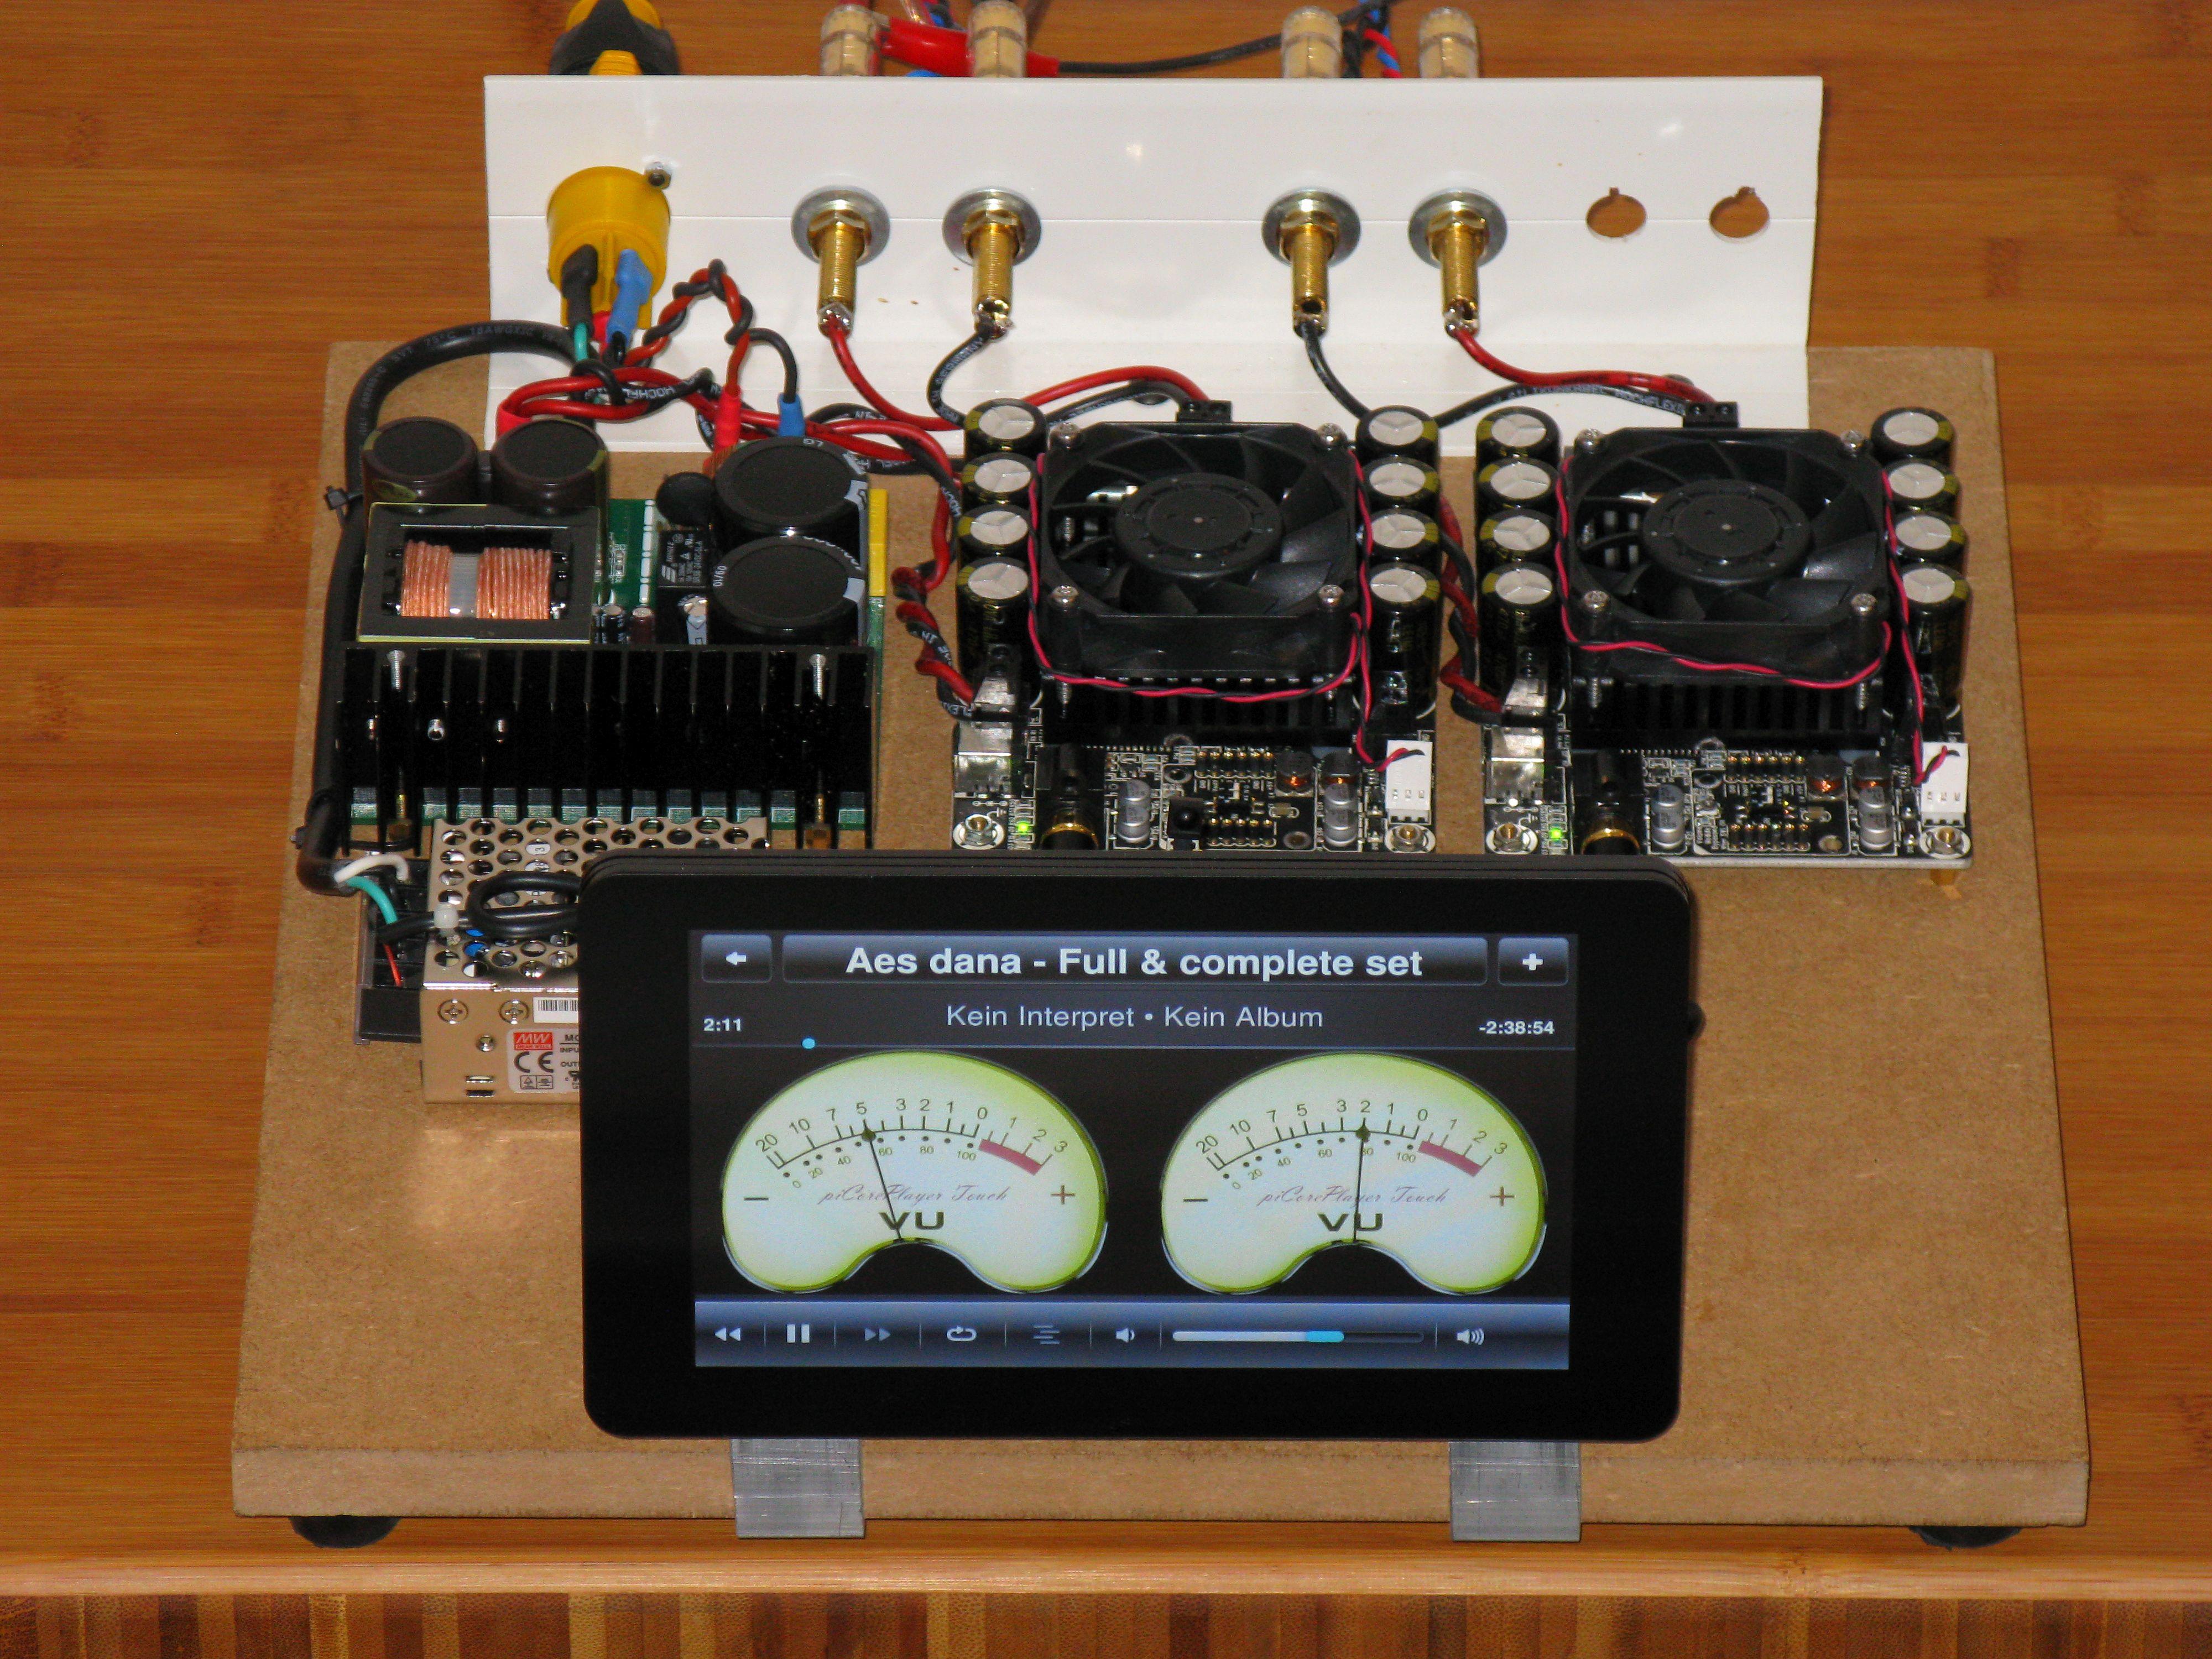 Gremlin Kleiner Class T Amp Ganz Gro Archiv Seite 5 Diy Irs2092 D Amplifier Circuit Lm1036 Tone Controlled Power Hifi Forum